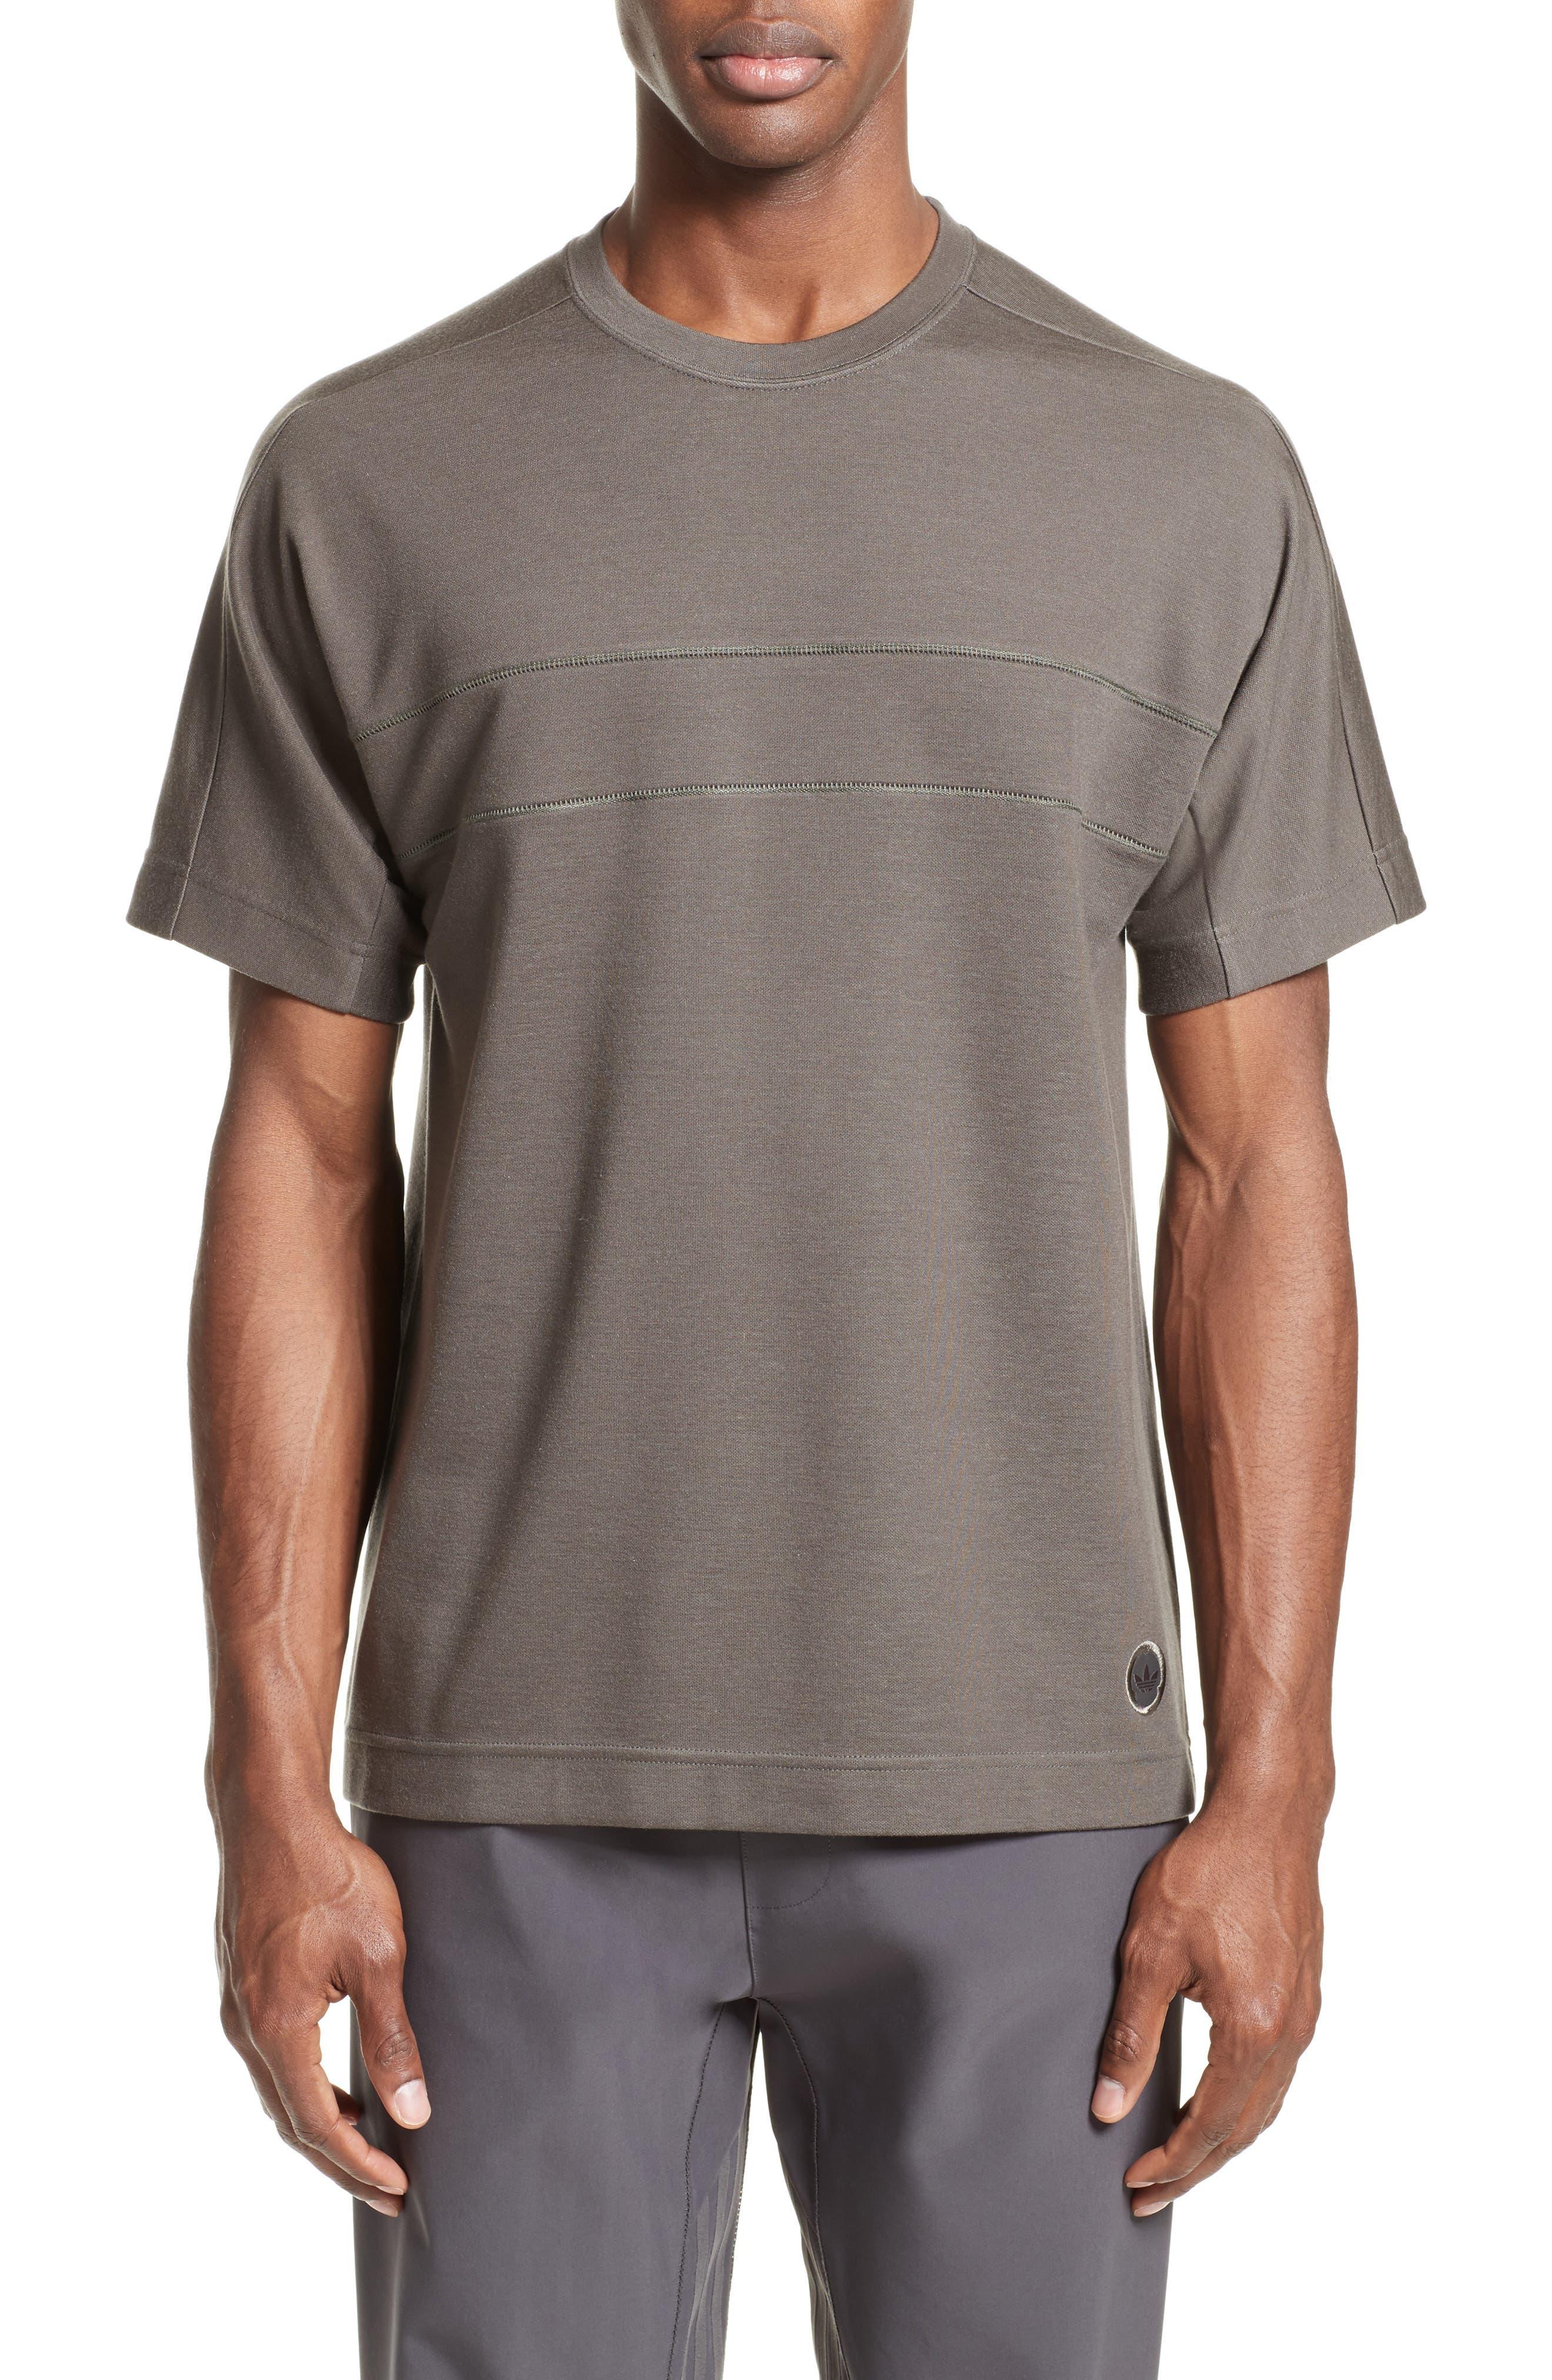 Main Image - wings + horns x adidas Crewneck T-Shirt